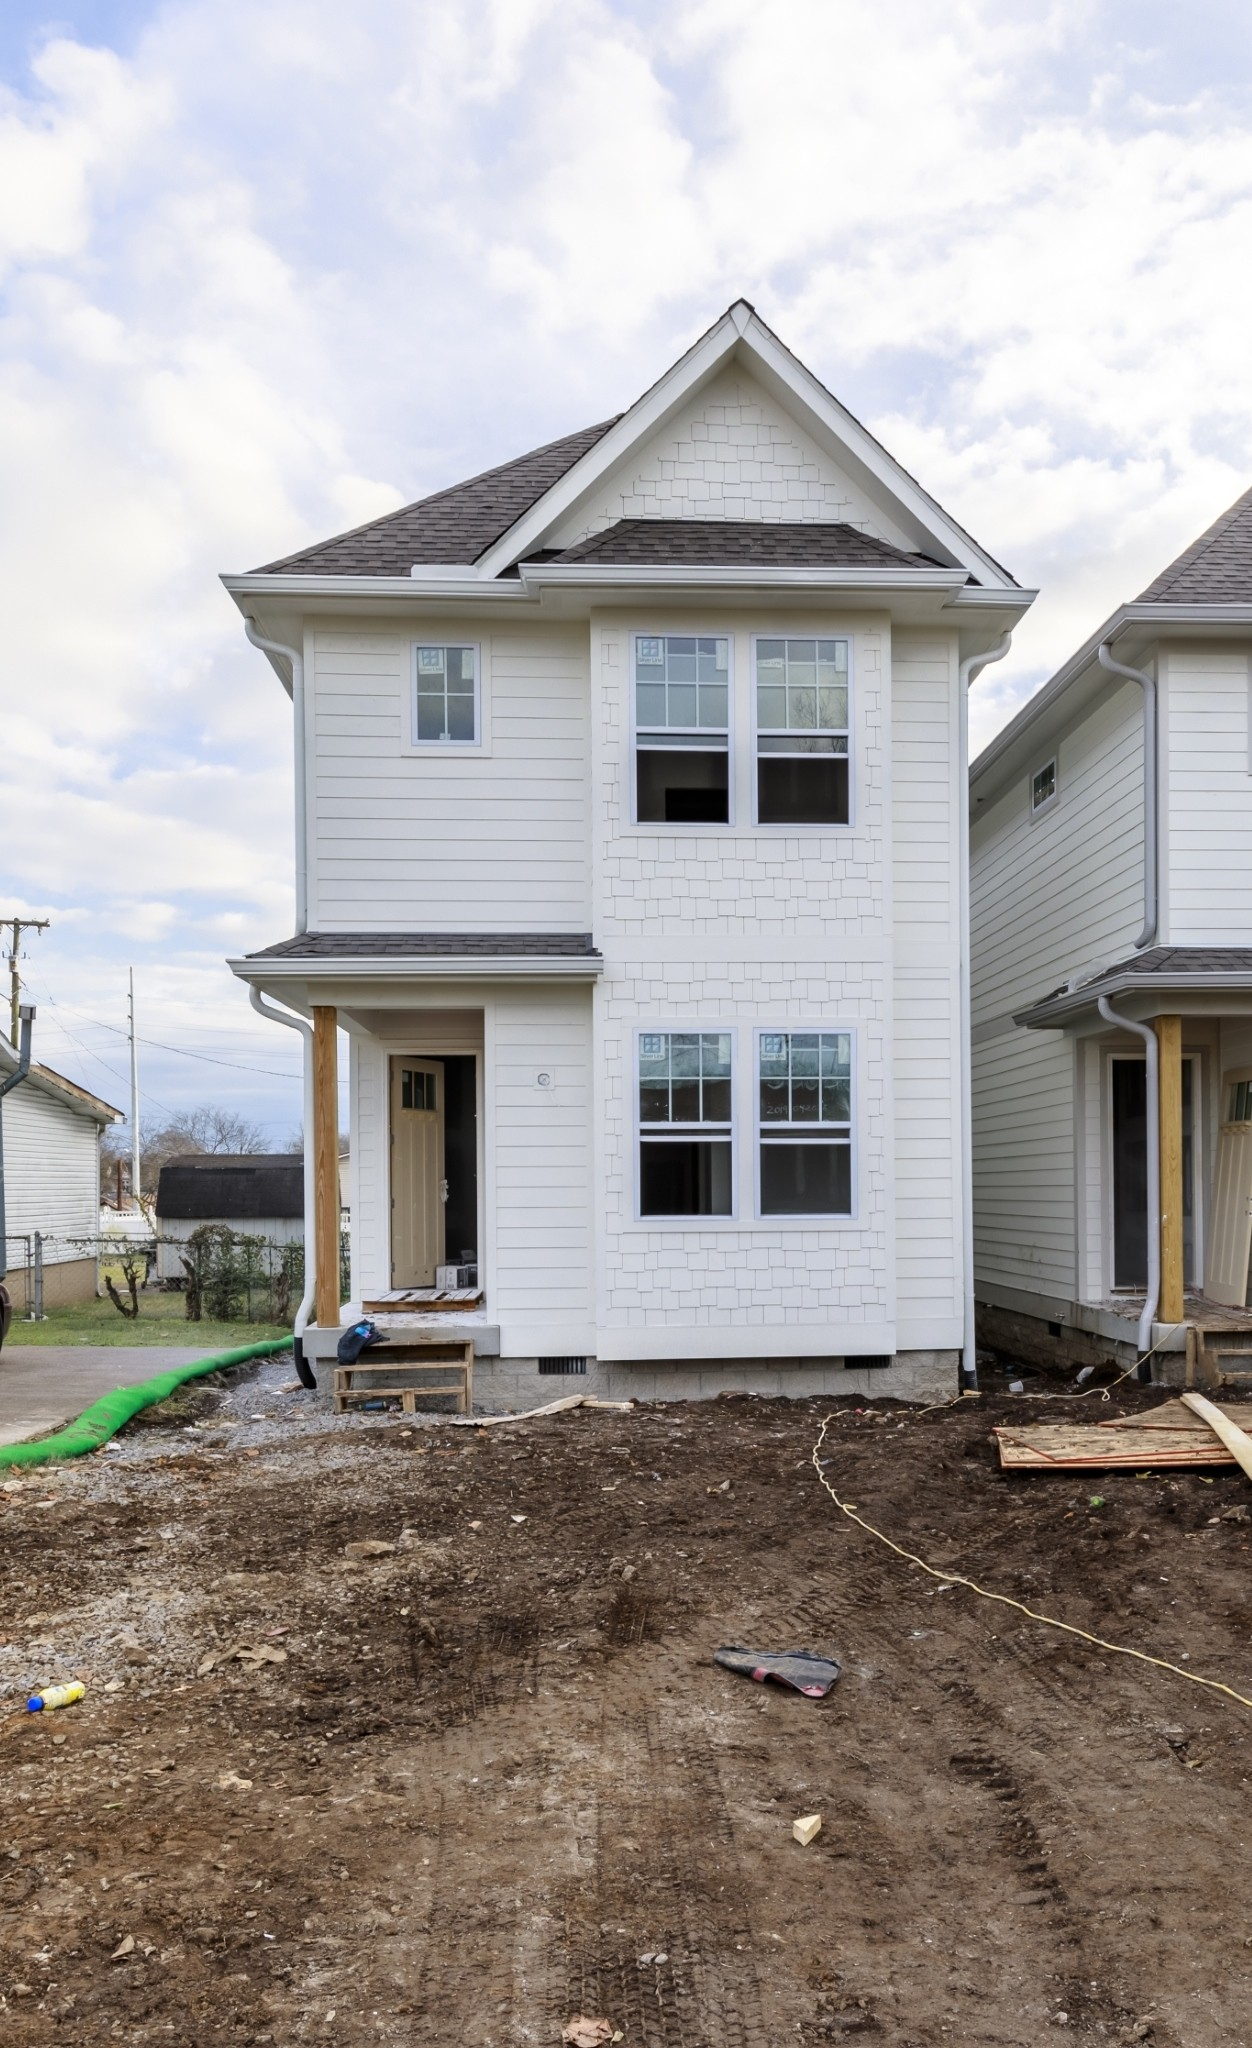 5603A Pennsylvania Ave., Nashville, TN 37209 - Nashville, TN real estate listing